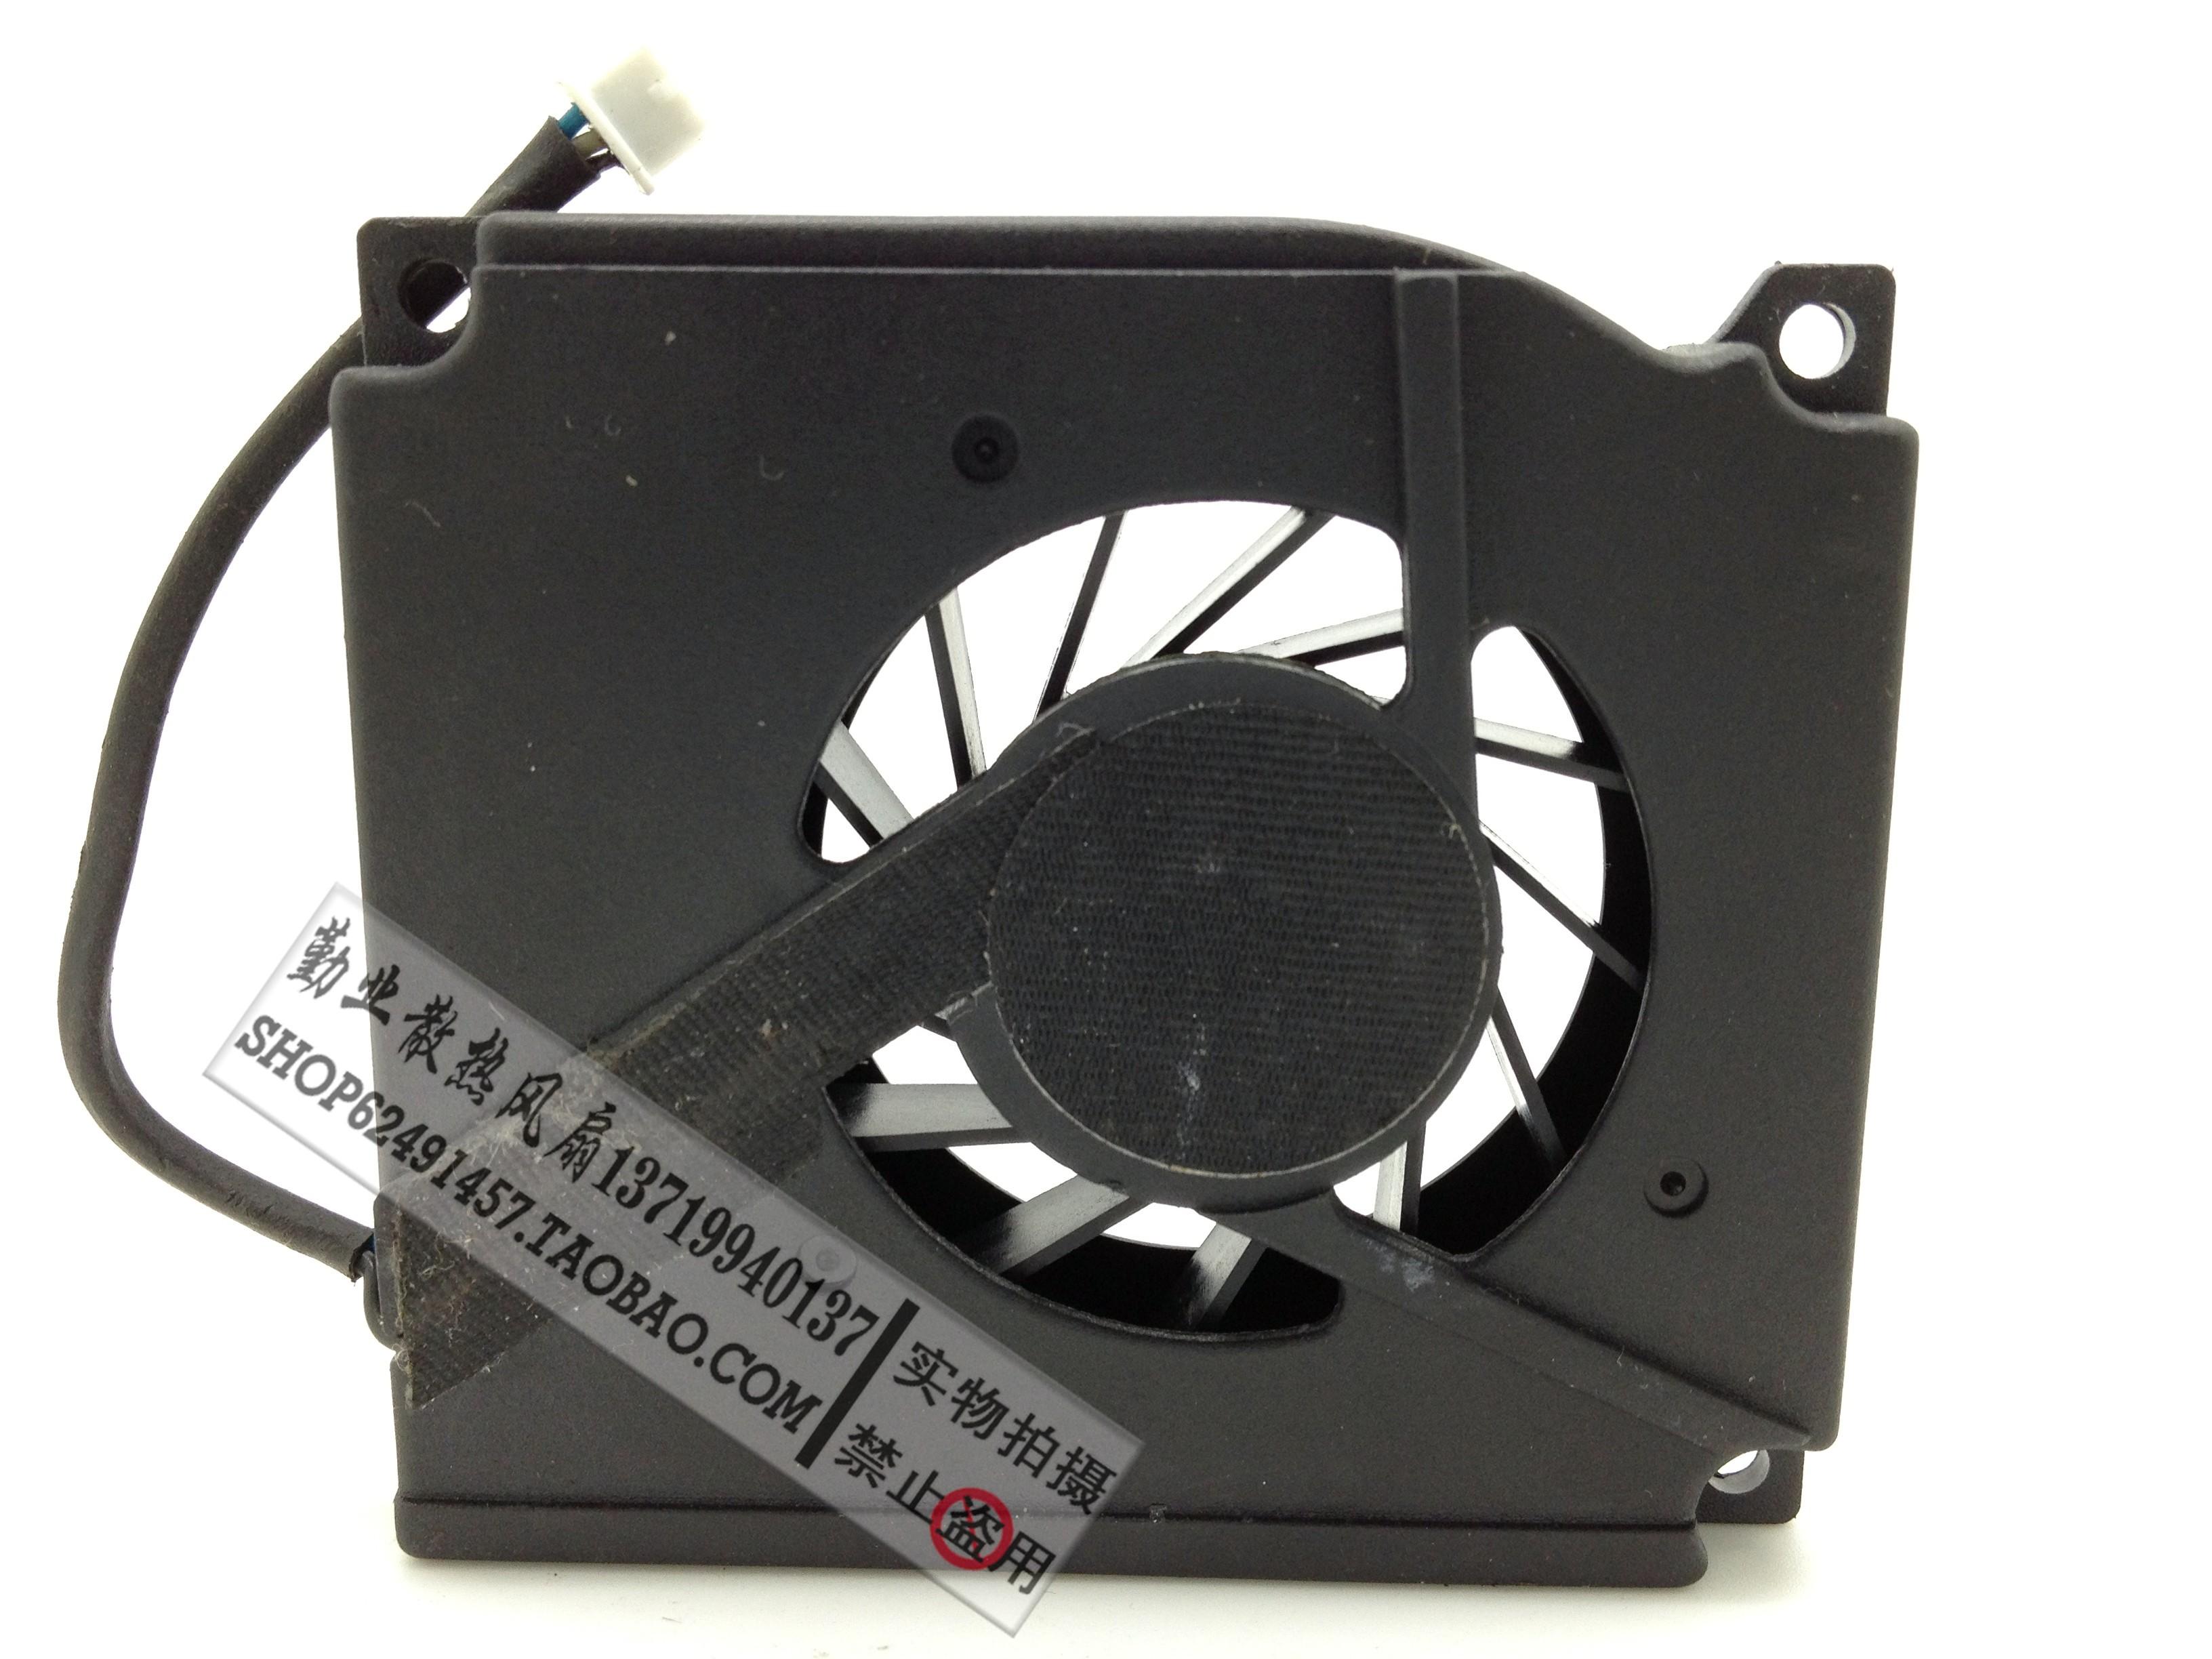 Вентилятор охлаждения ADDA  Dell Latitude D400 5V 0.20A AB0605HB